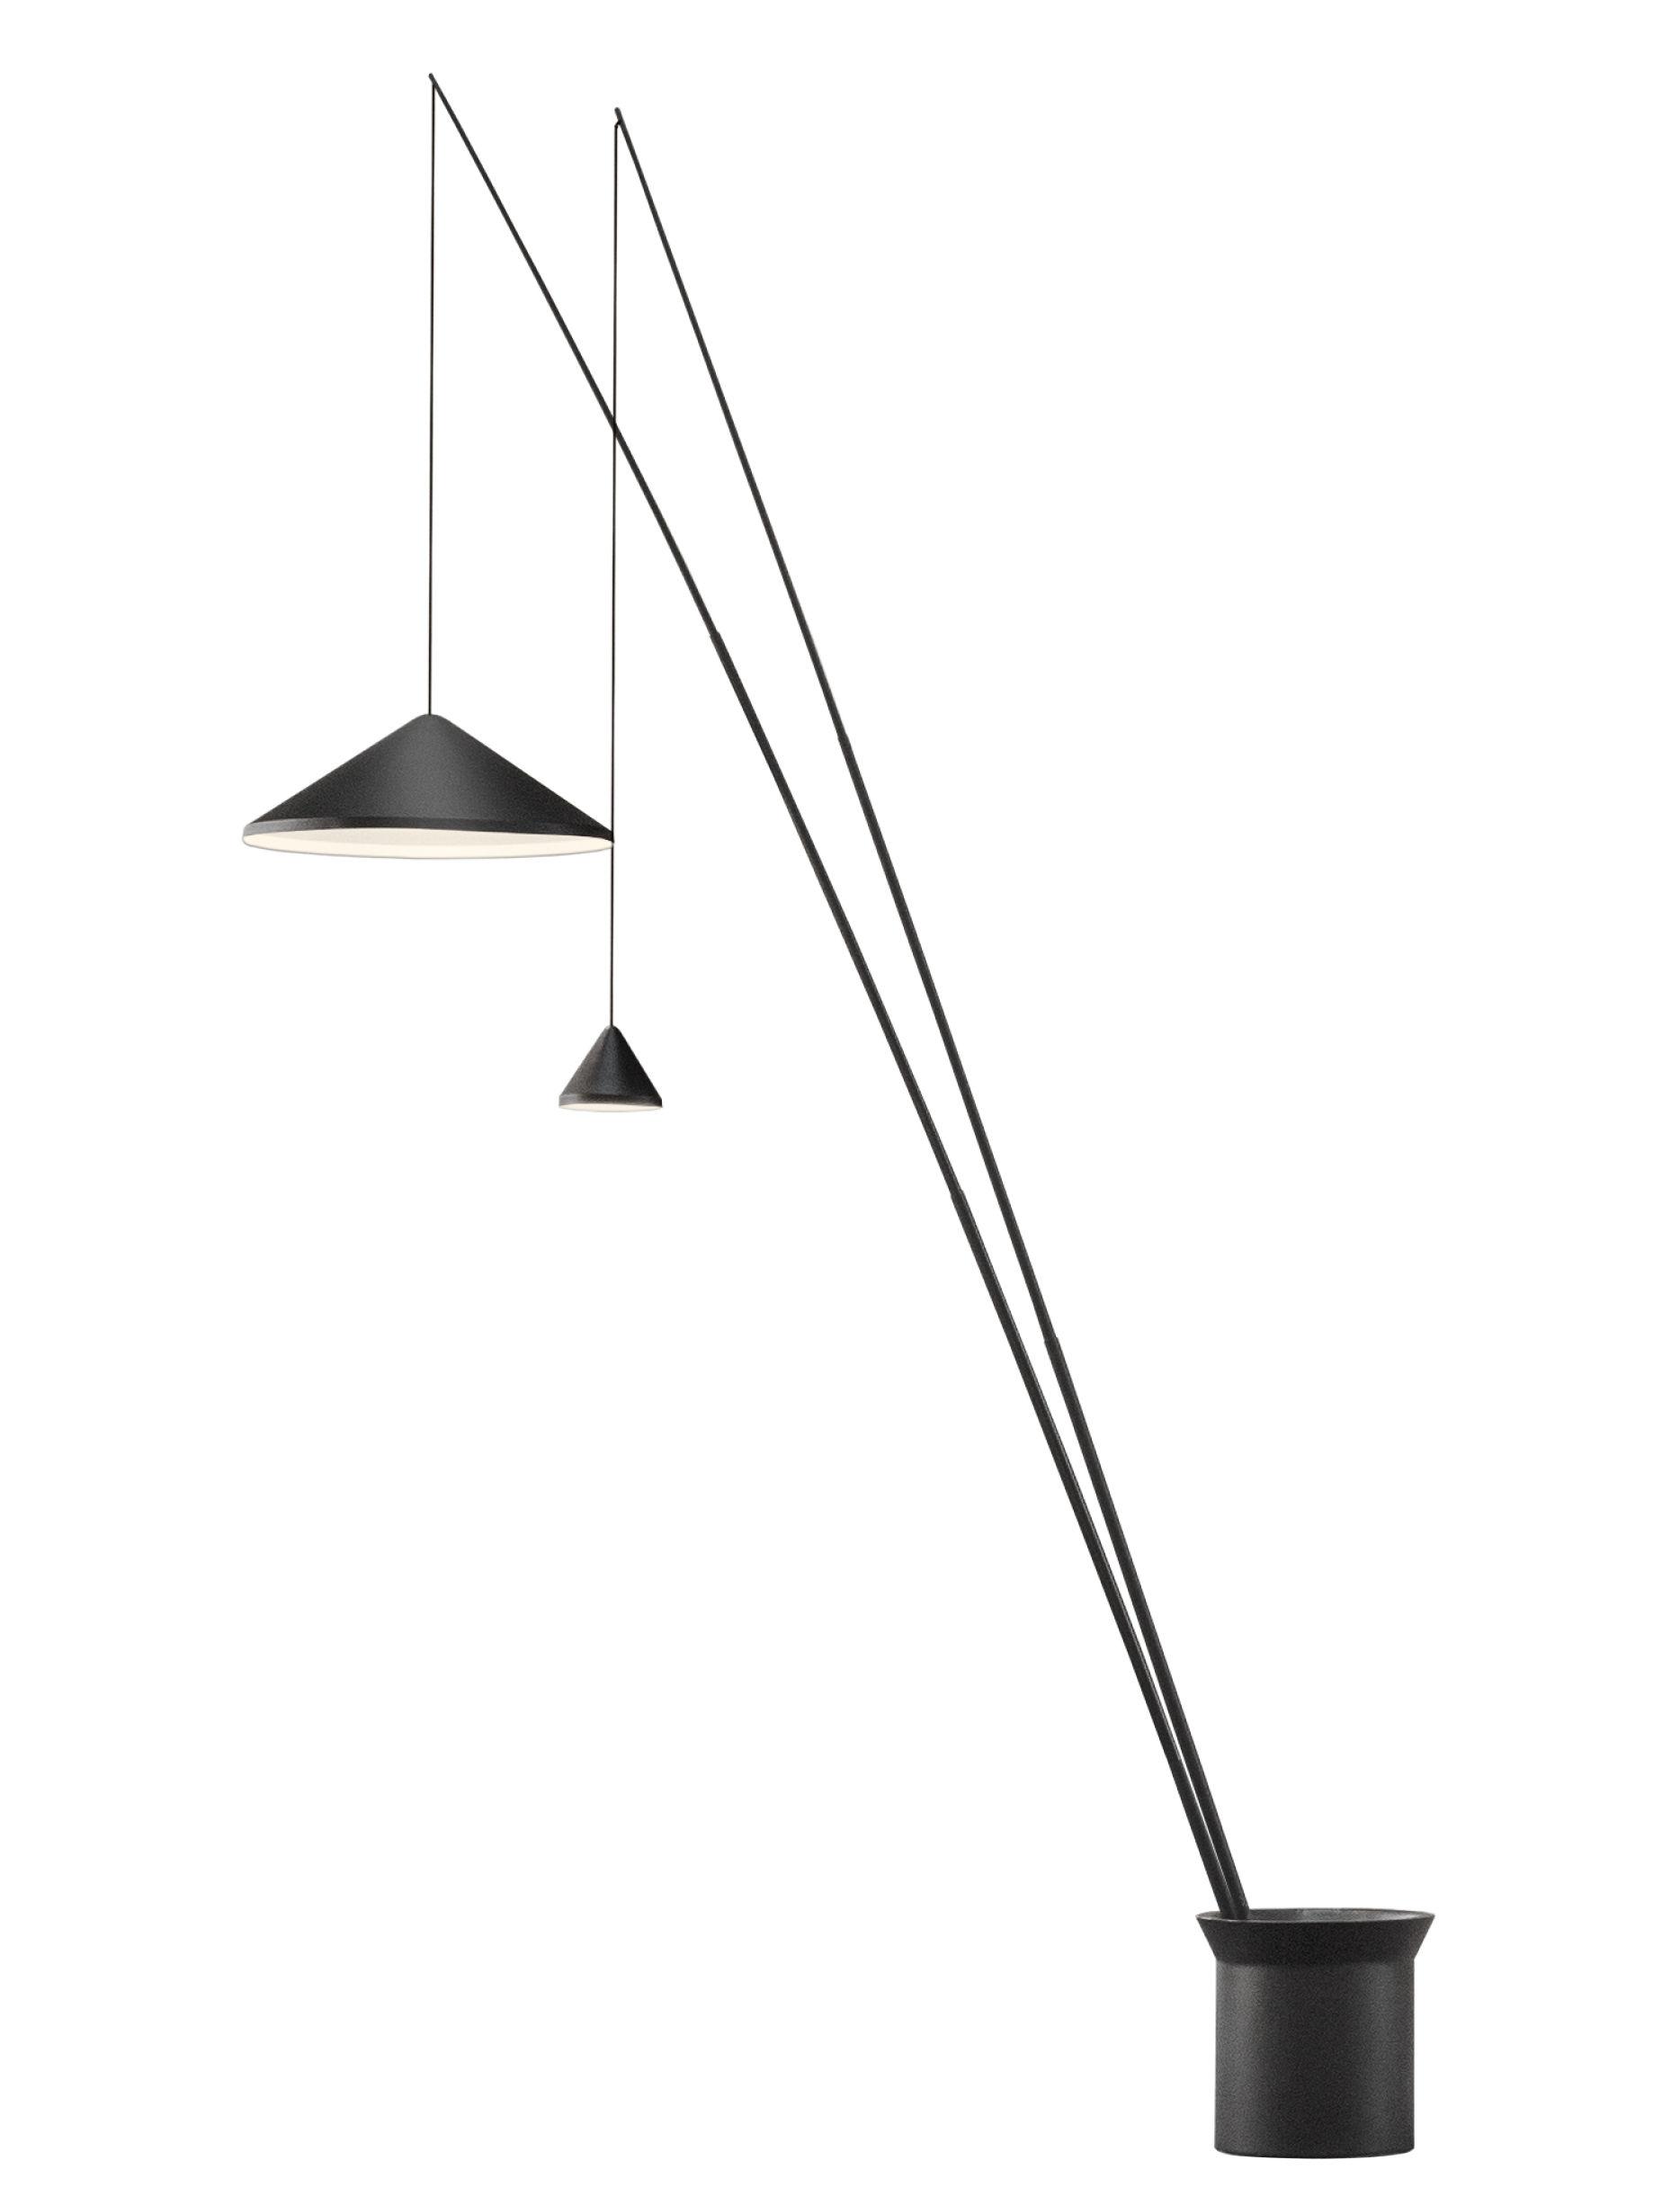 Illuminazione - Lampade da terra - Lampada a stelo North LED - / 2 paralumi regolabili - Ø 60 + Ø 16 cm di Vibia - Ø 60 cm + Ø 16 cm / Grafite opaco - Acciaio, Alluminio, Fibra di carbonio